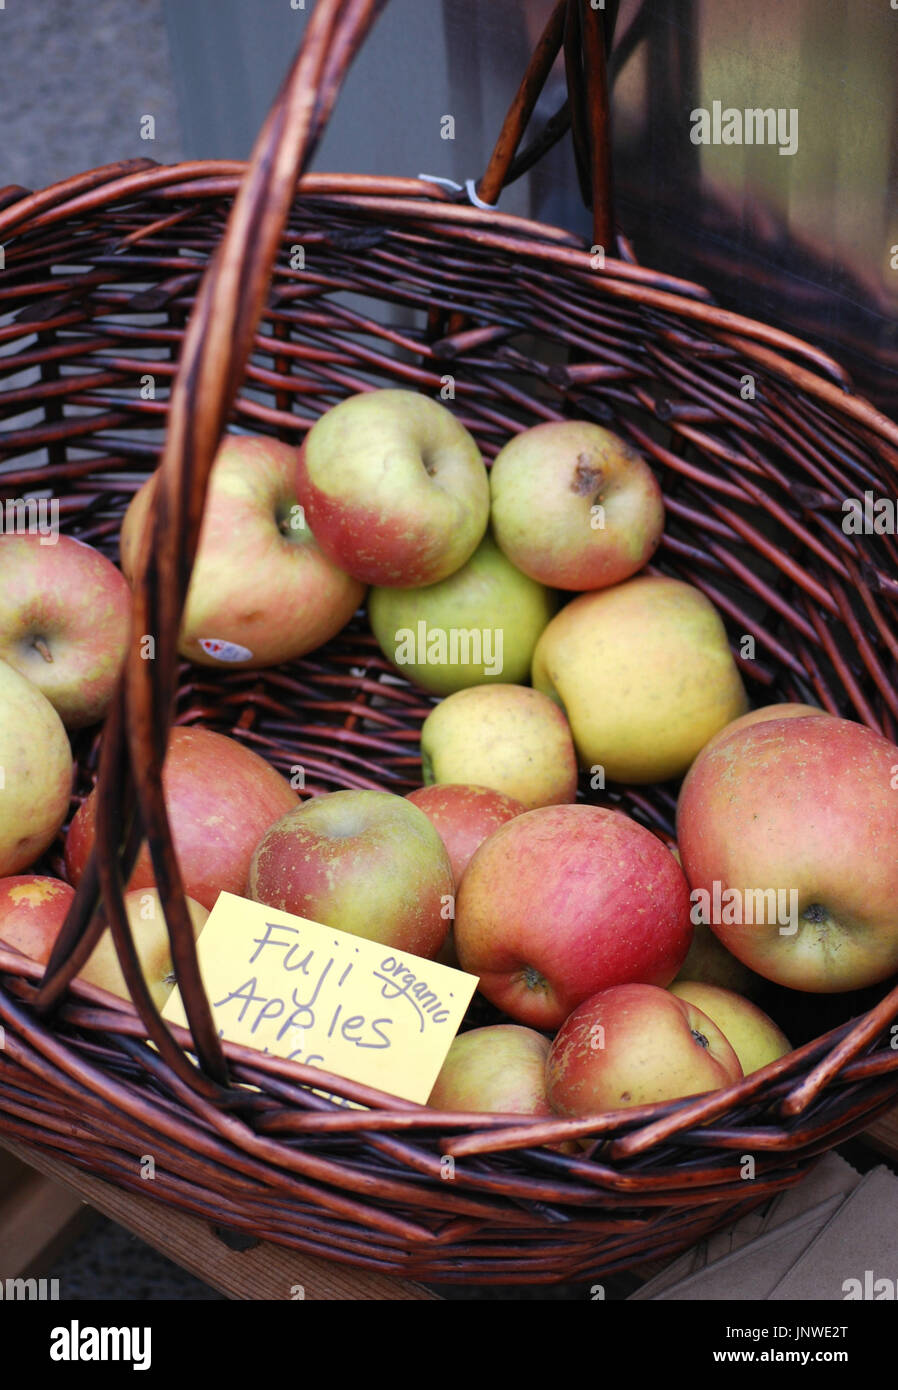 Basket of Fresh Picked Organic Fuji Apples - Stock Image